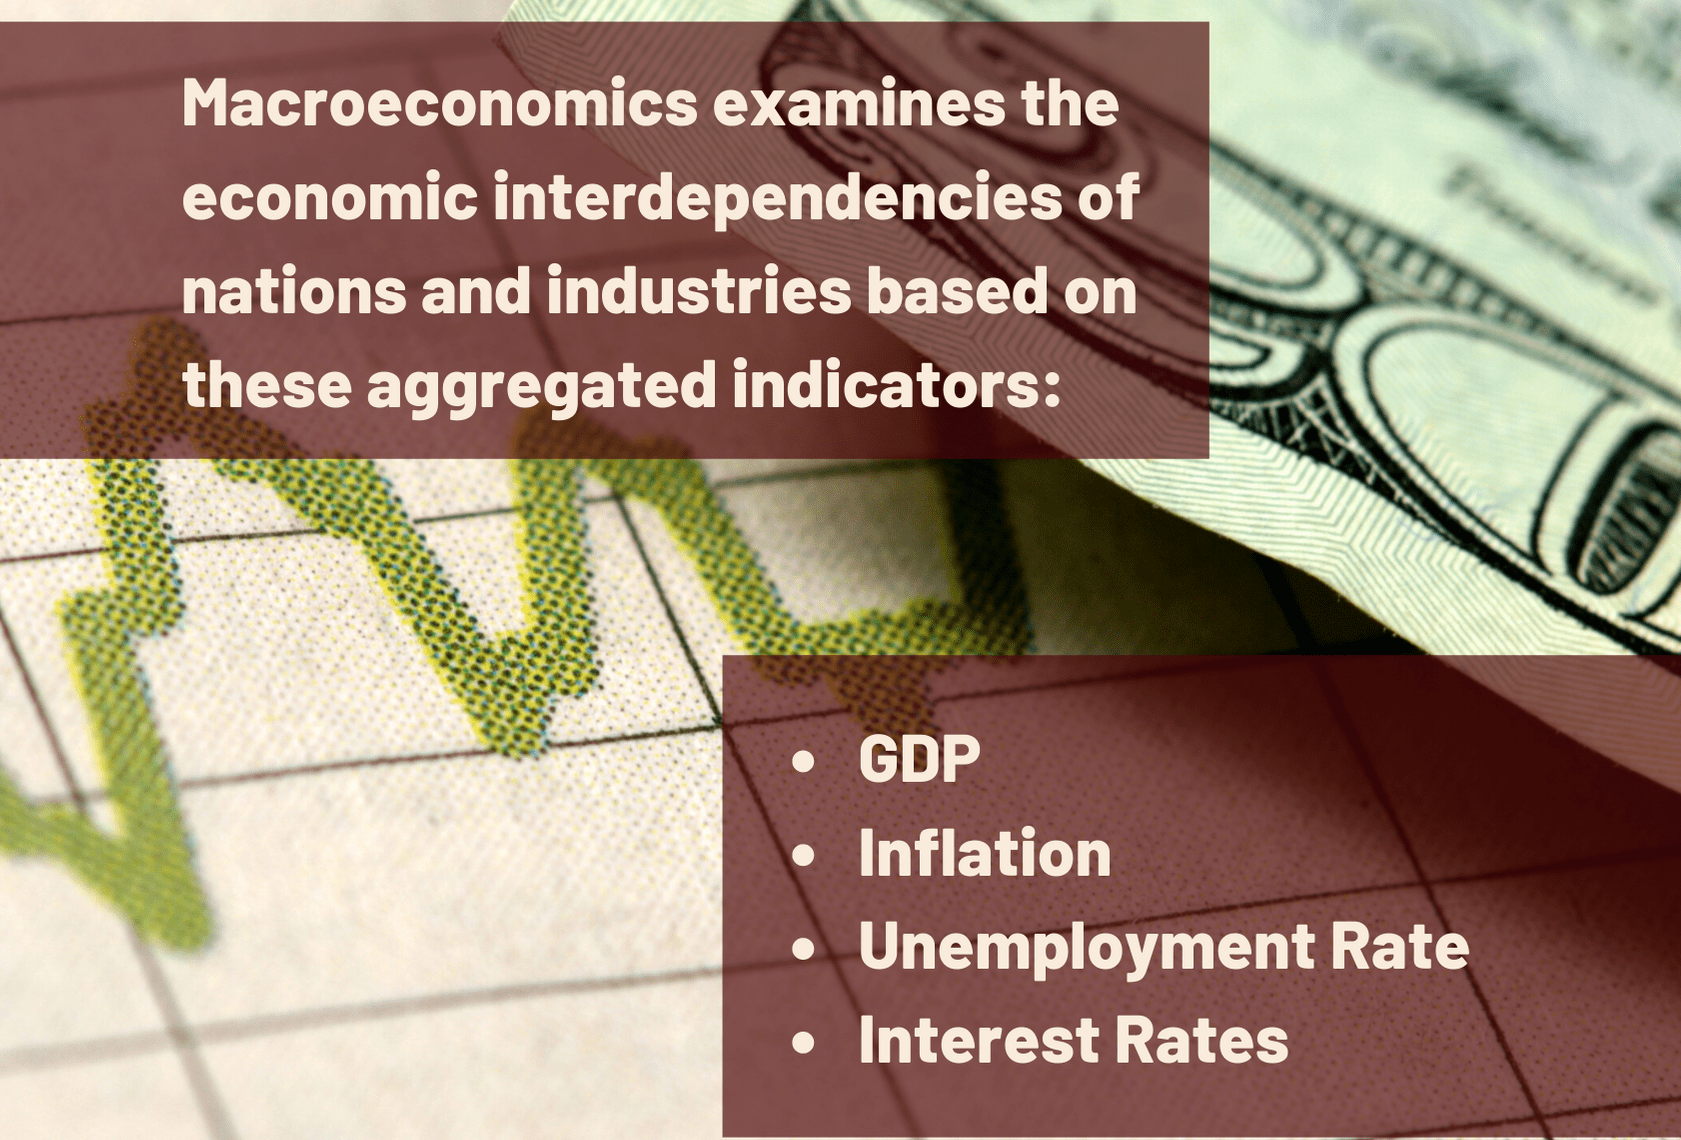 macroeconomics course fact 2